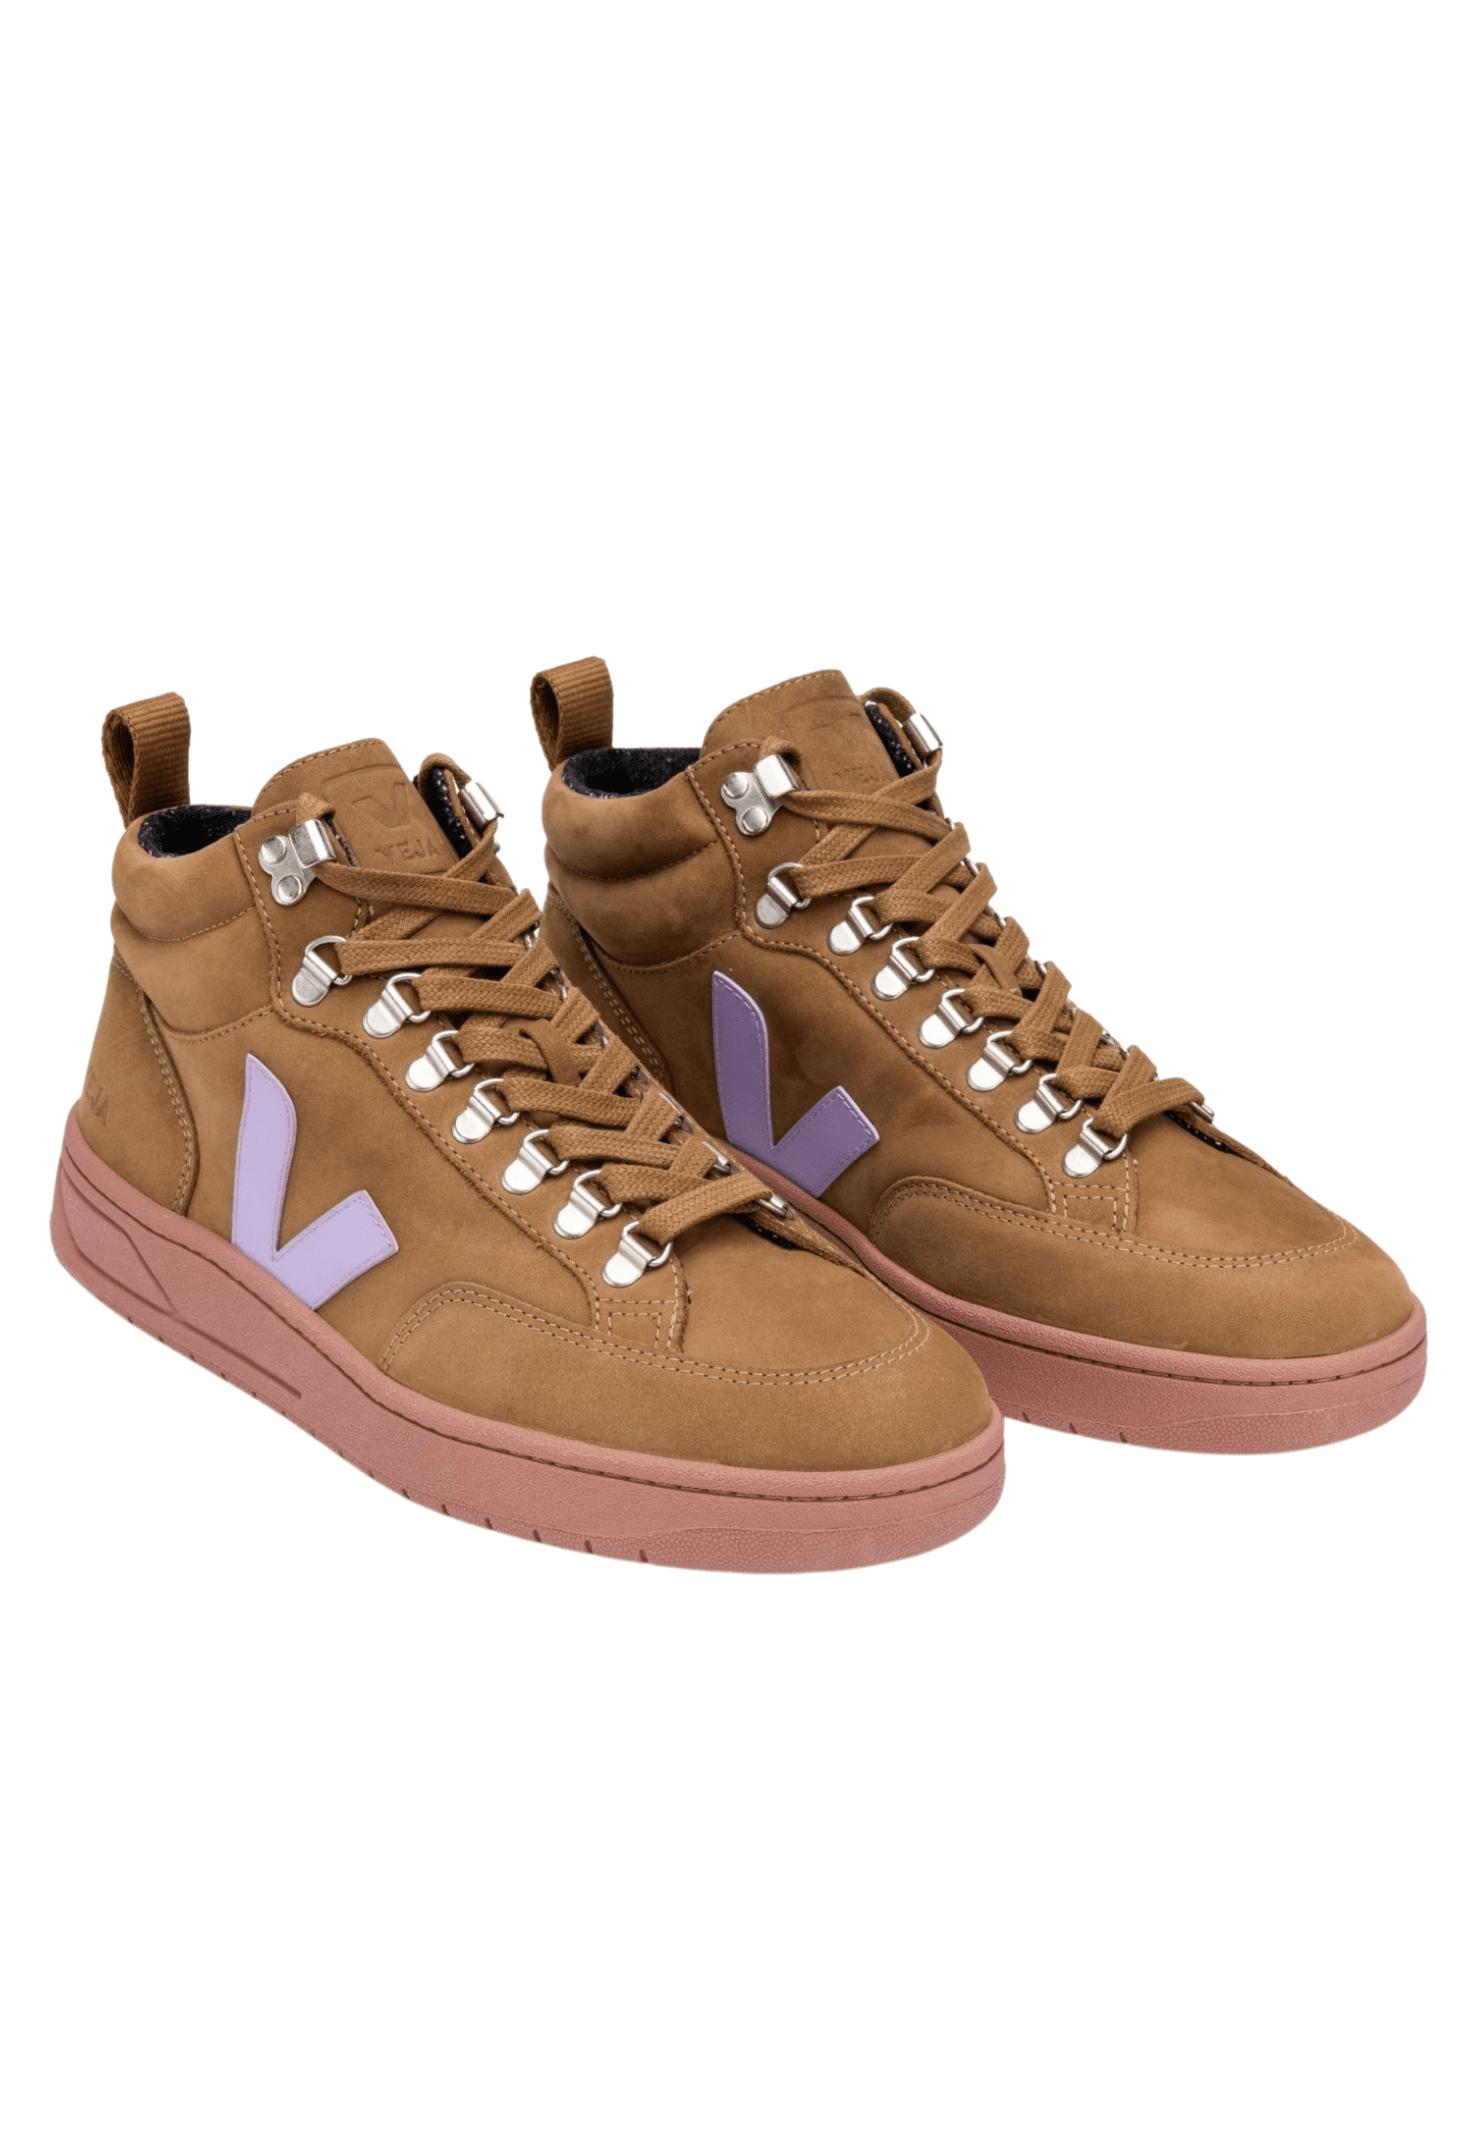 Roraima High Top Sneaker Brown Lavender